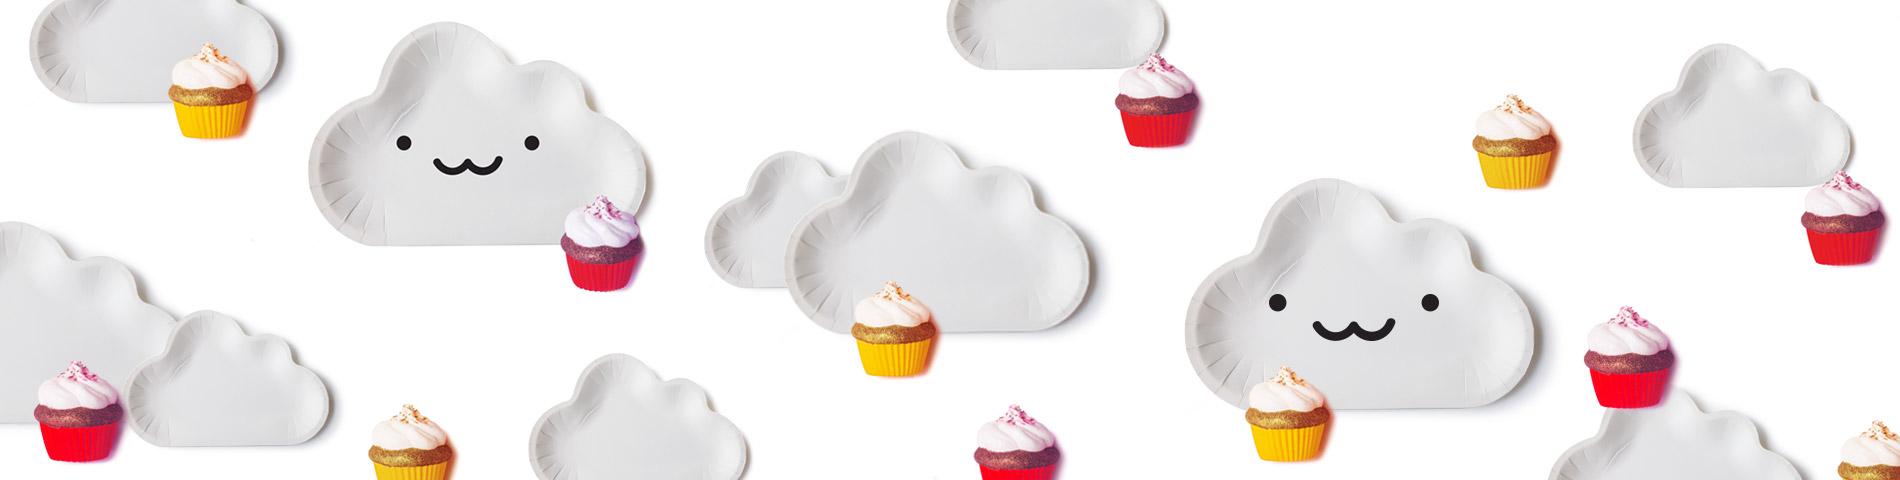 Lastest    Forma de nube    Plato de pastel